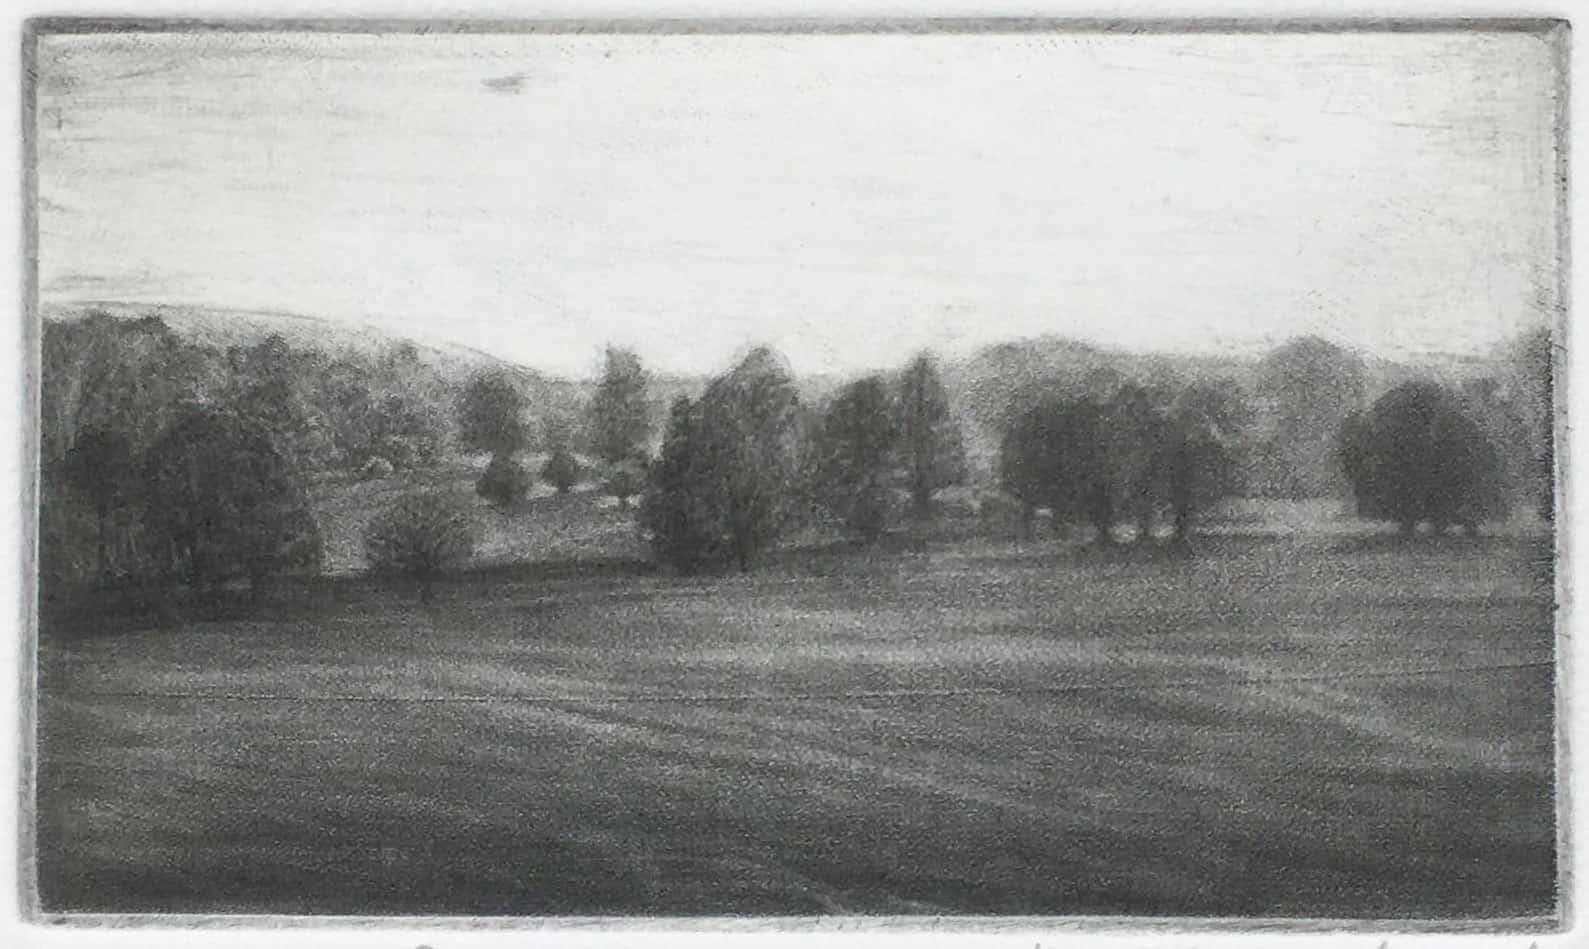 """Scotty Chase"" - black and white landscape of the English countryside manor park. Original print mezzotint by painter-printmaker Marina Kim"